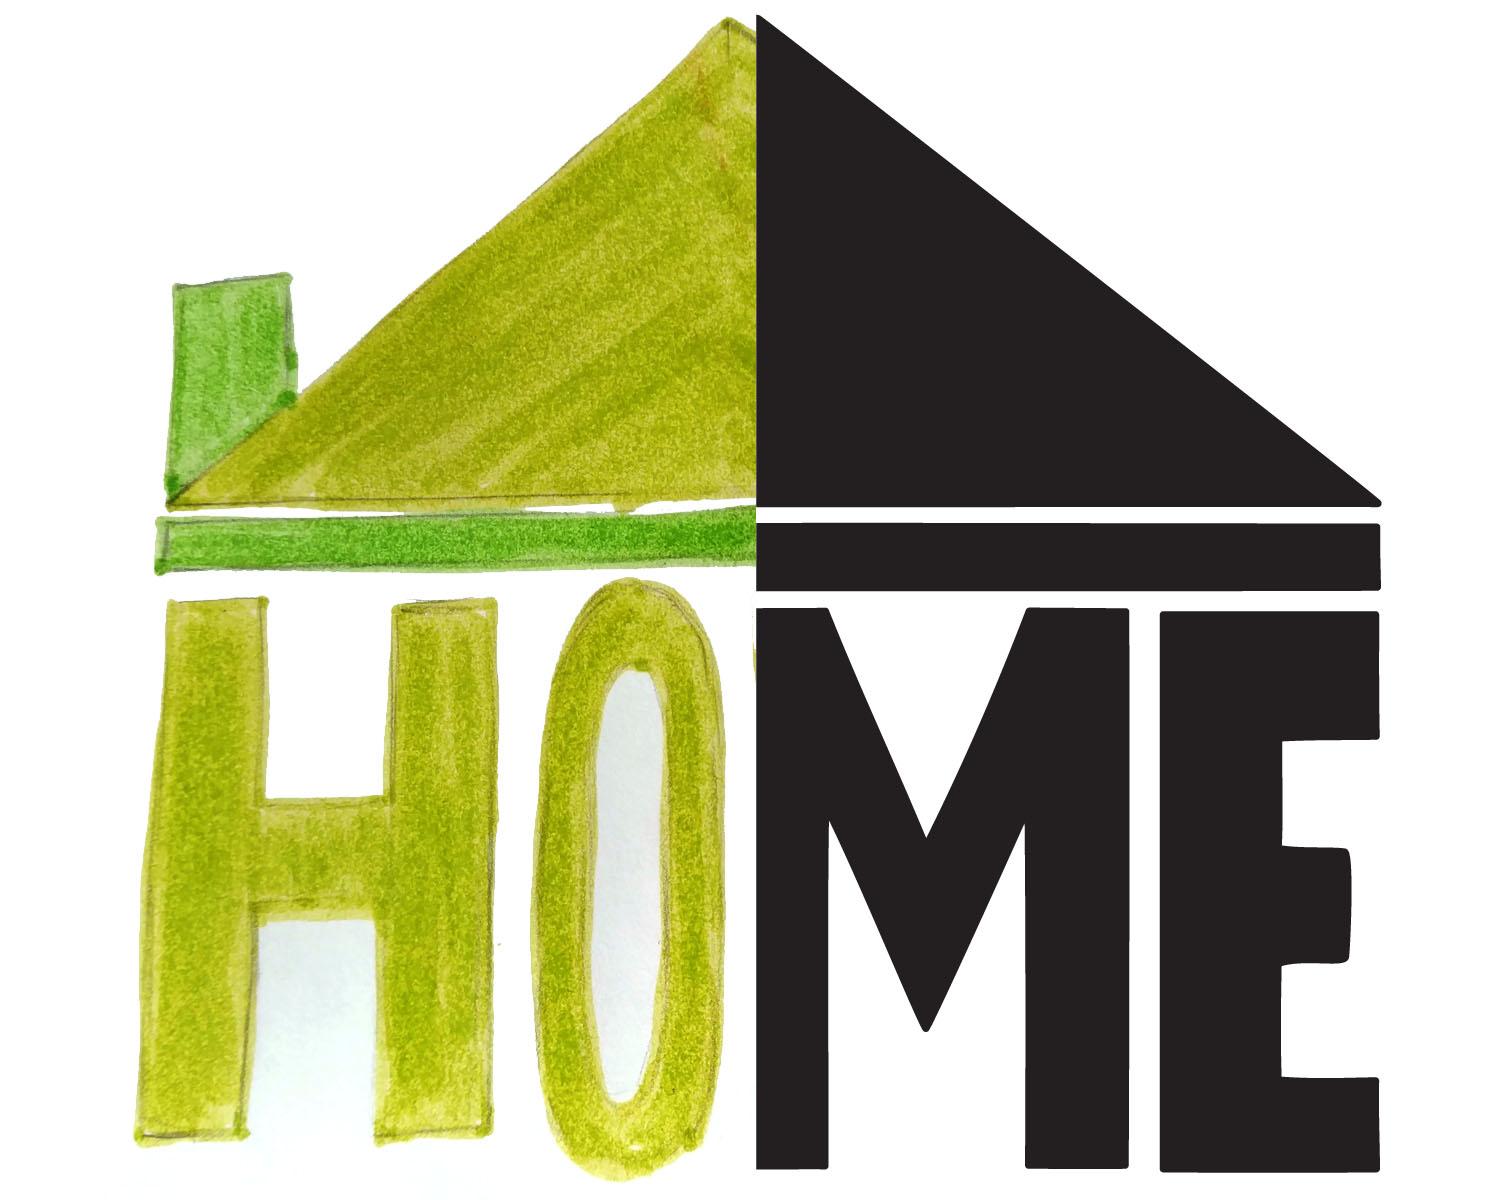 Home_FromSketchToHome.jpg